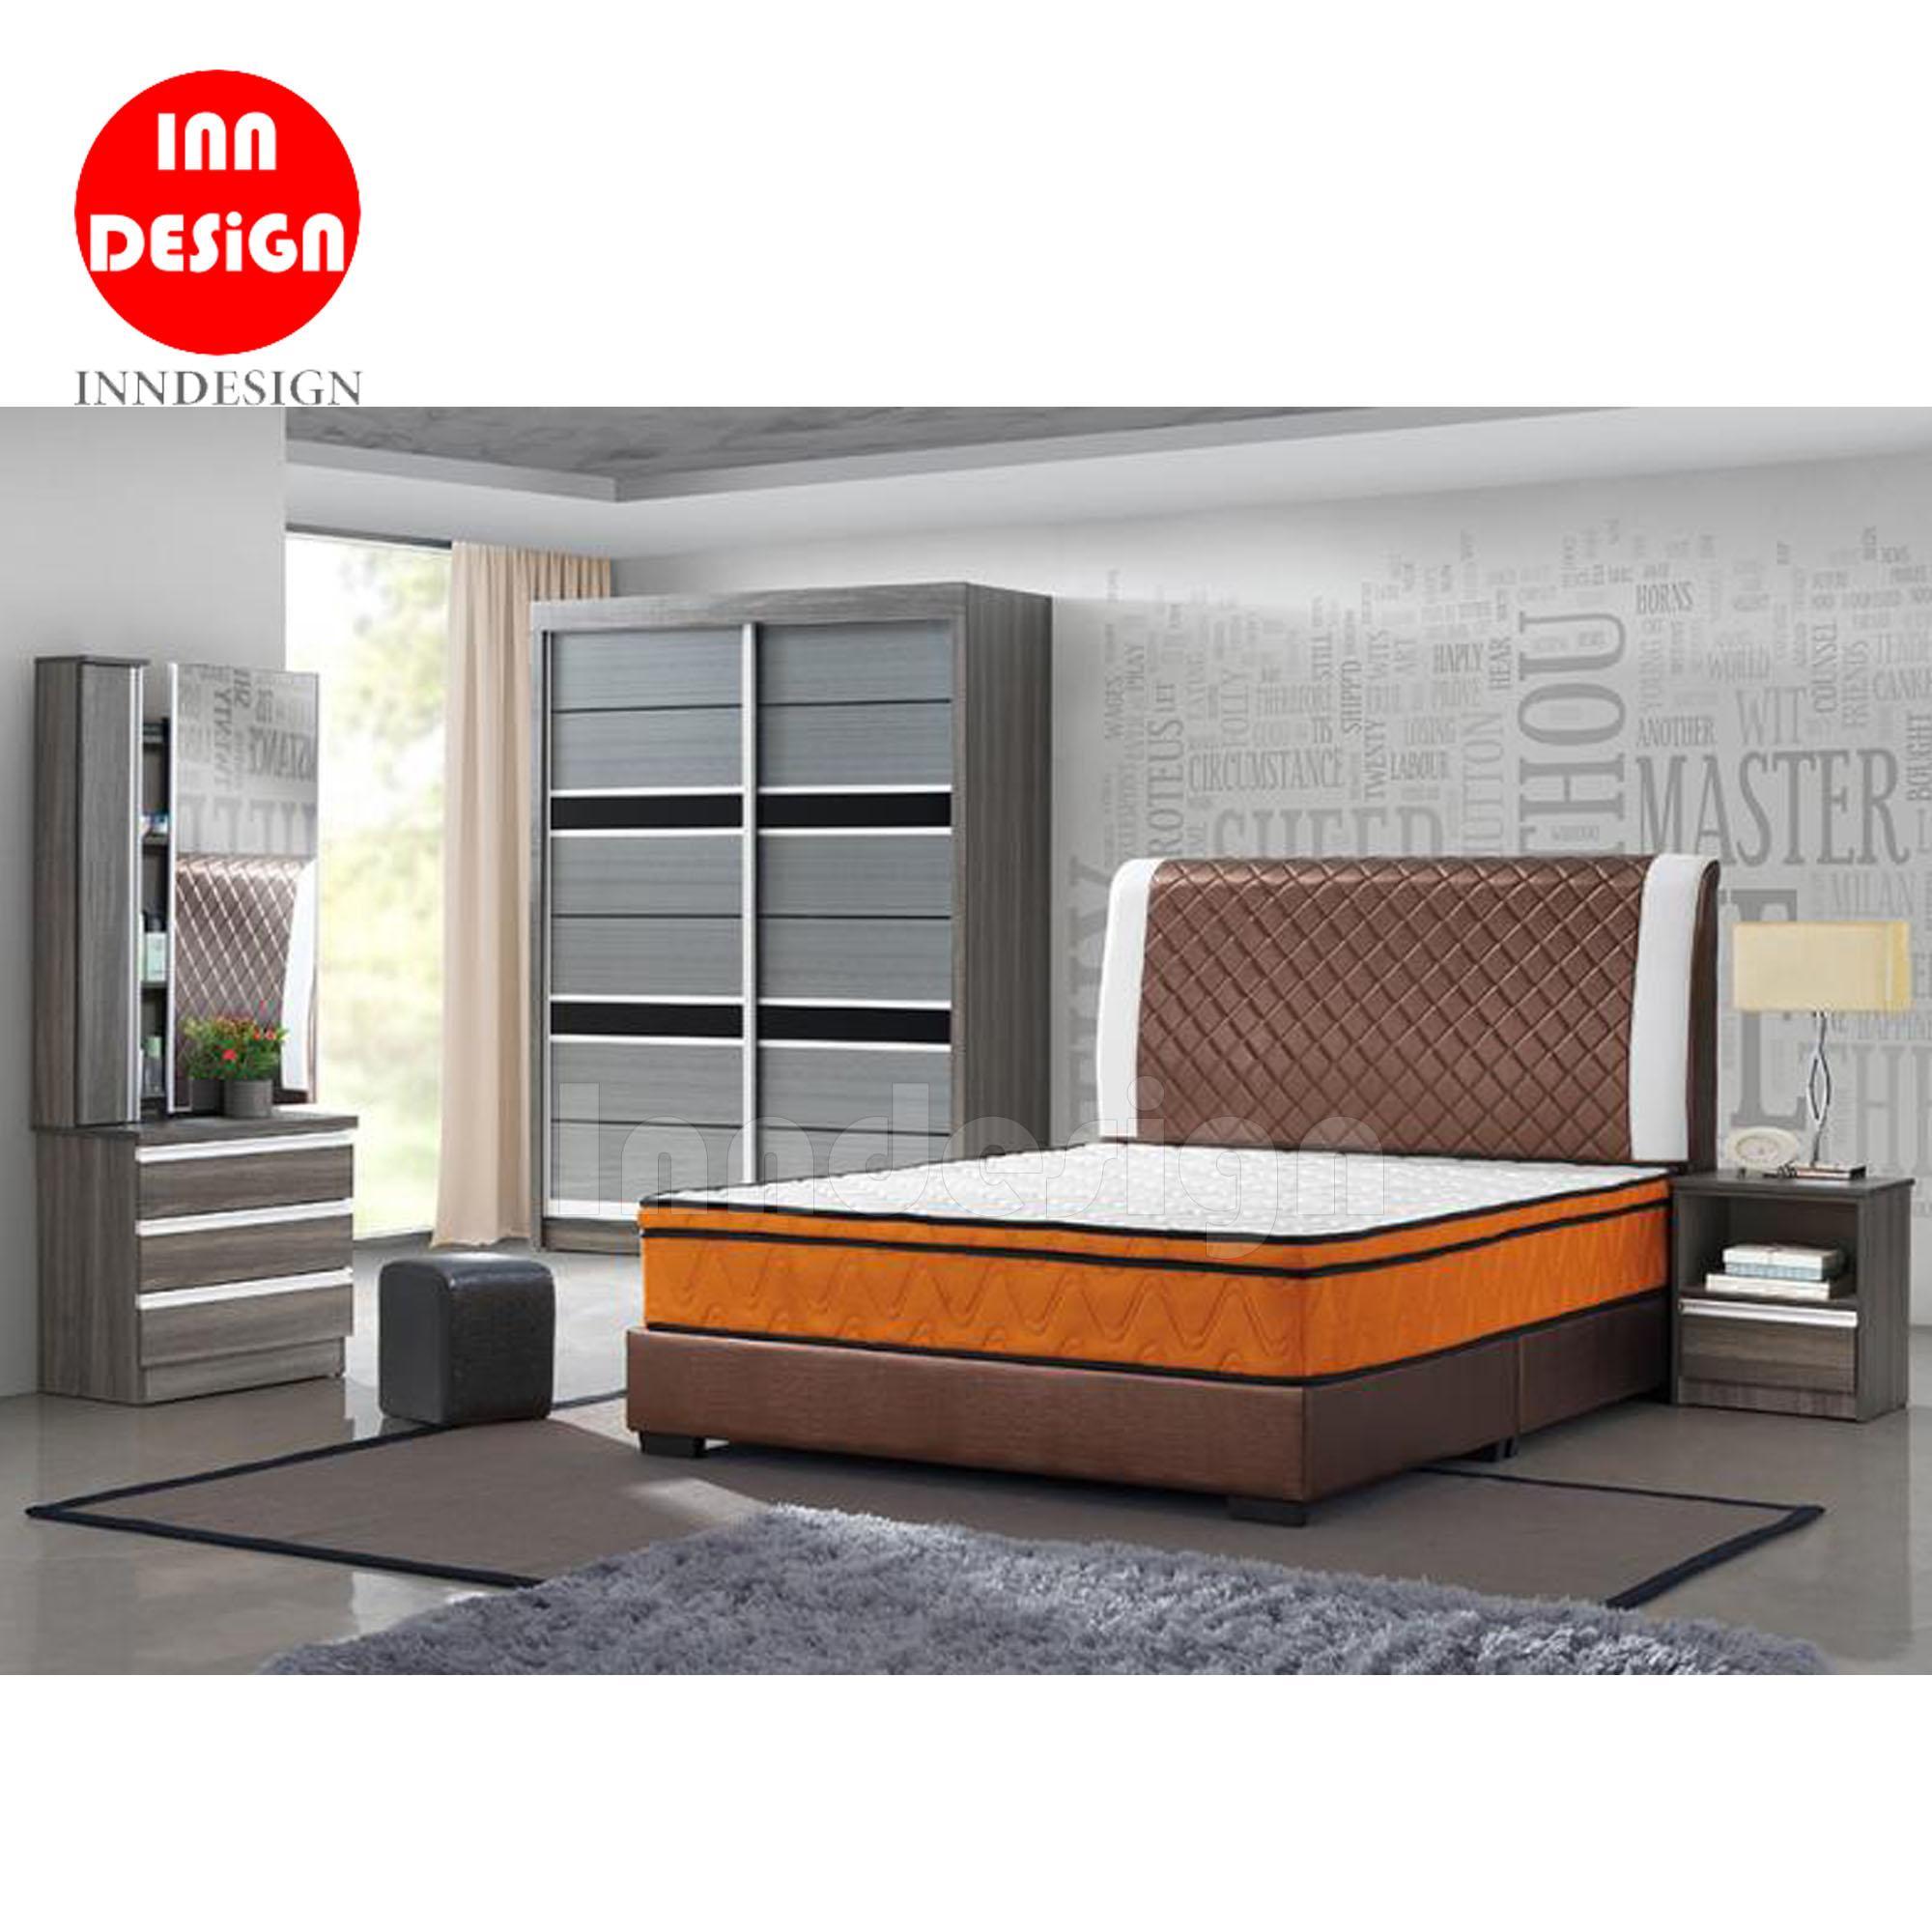 Jayden Full Bedroom Set (5ft Wardrobe / 10inches Queen Mattress / BedFrame / Dressing Table / Bedside Table)